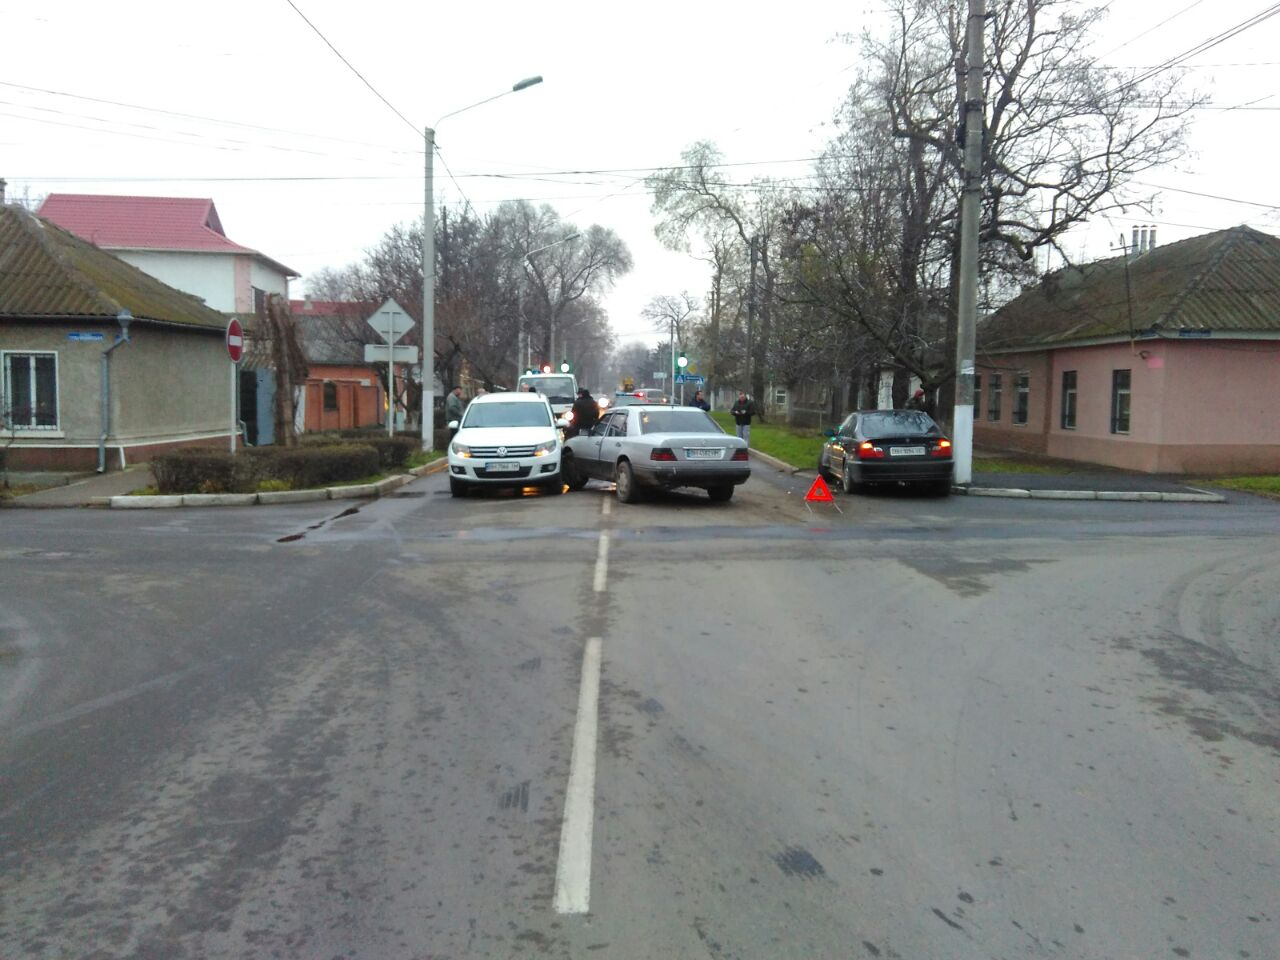 Бильярд на дороге: в Измаиле Mercedes протаранил BMW и Volkswagen